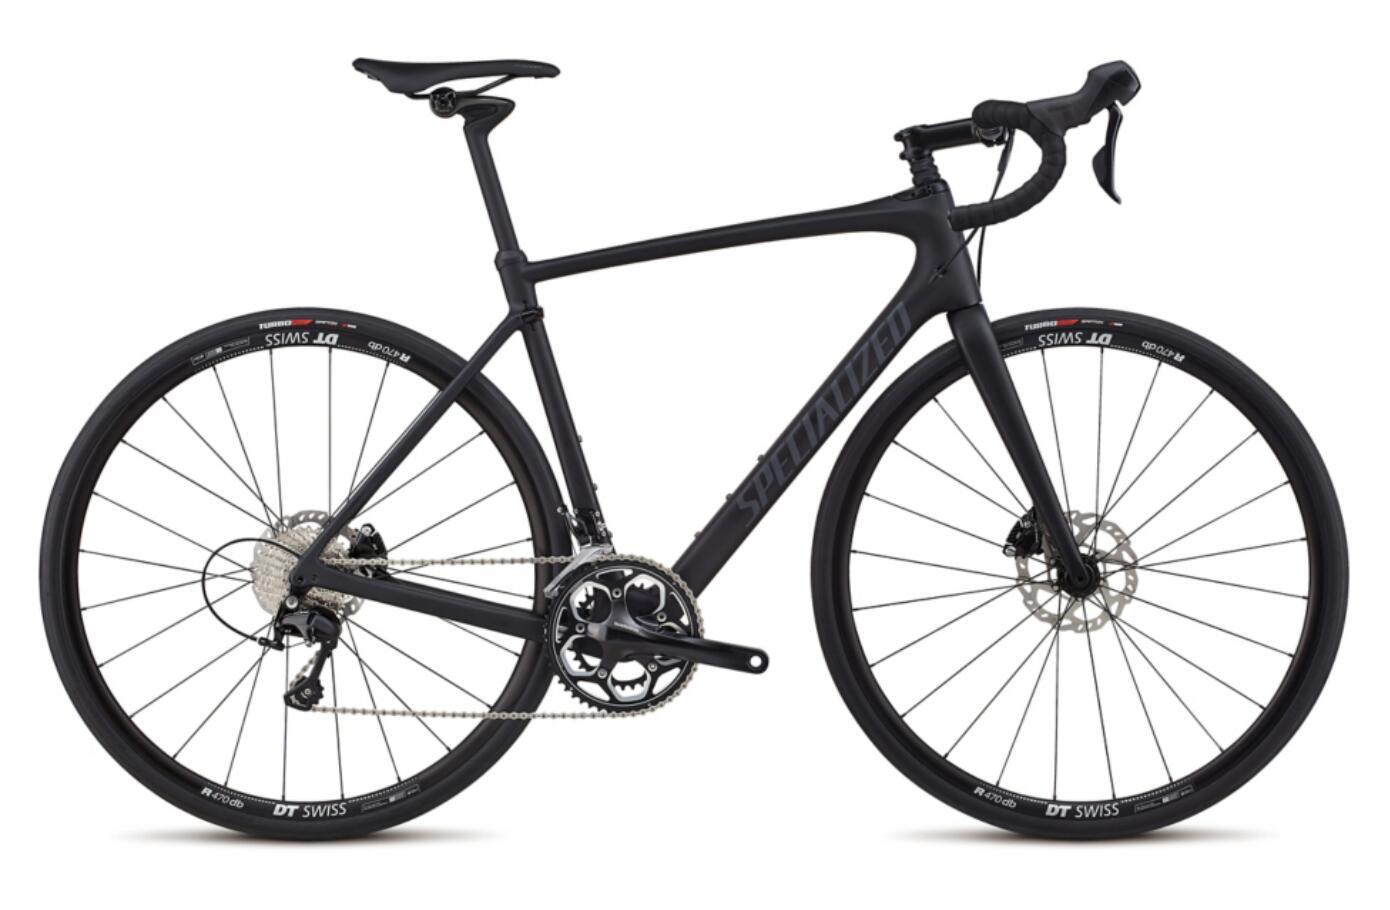 2018 Roubaix Elite Carbon Road Bike